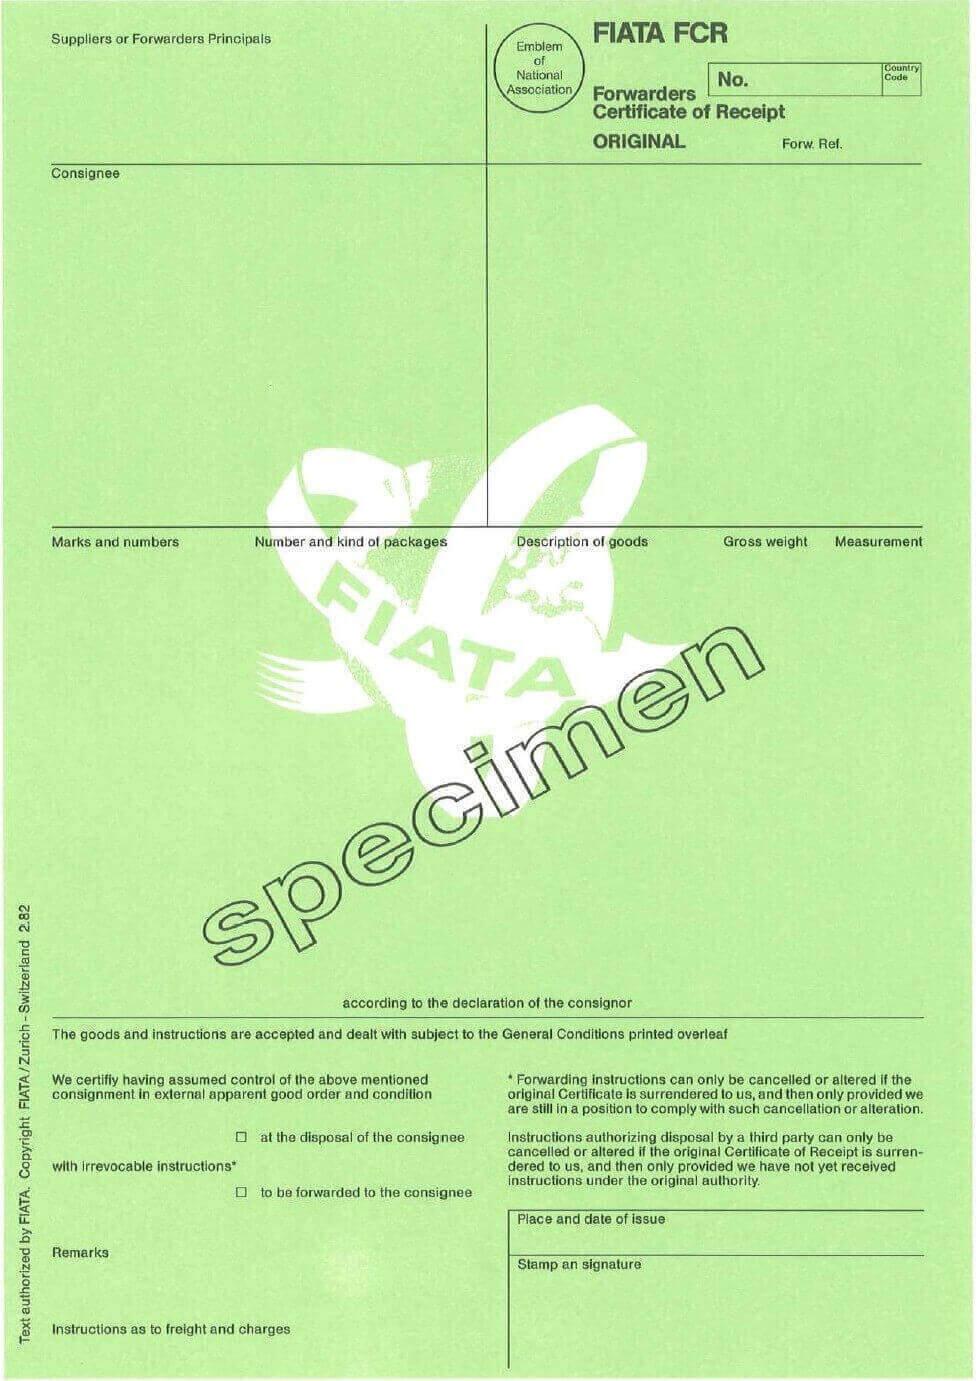 FCR Forwarders Certificate of Receipt